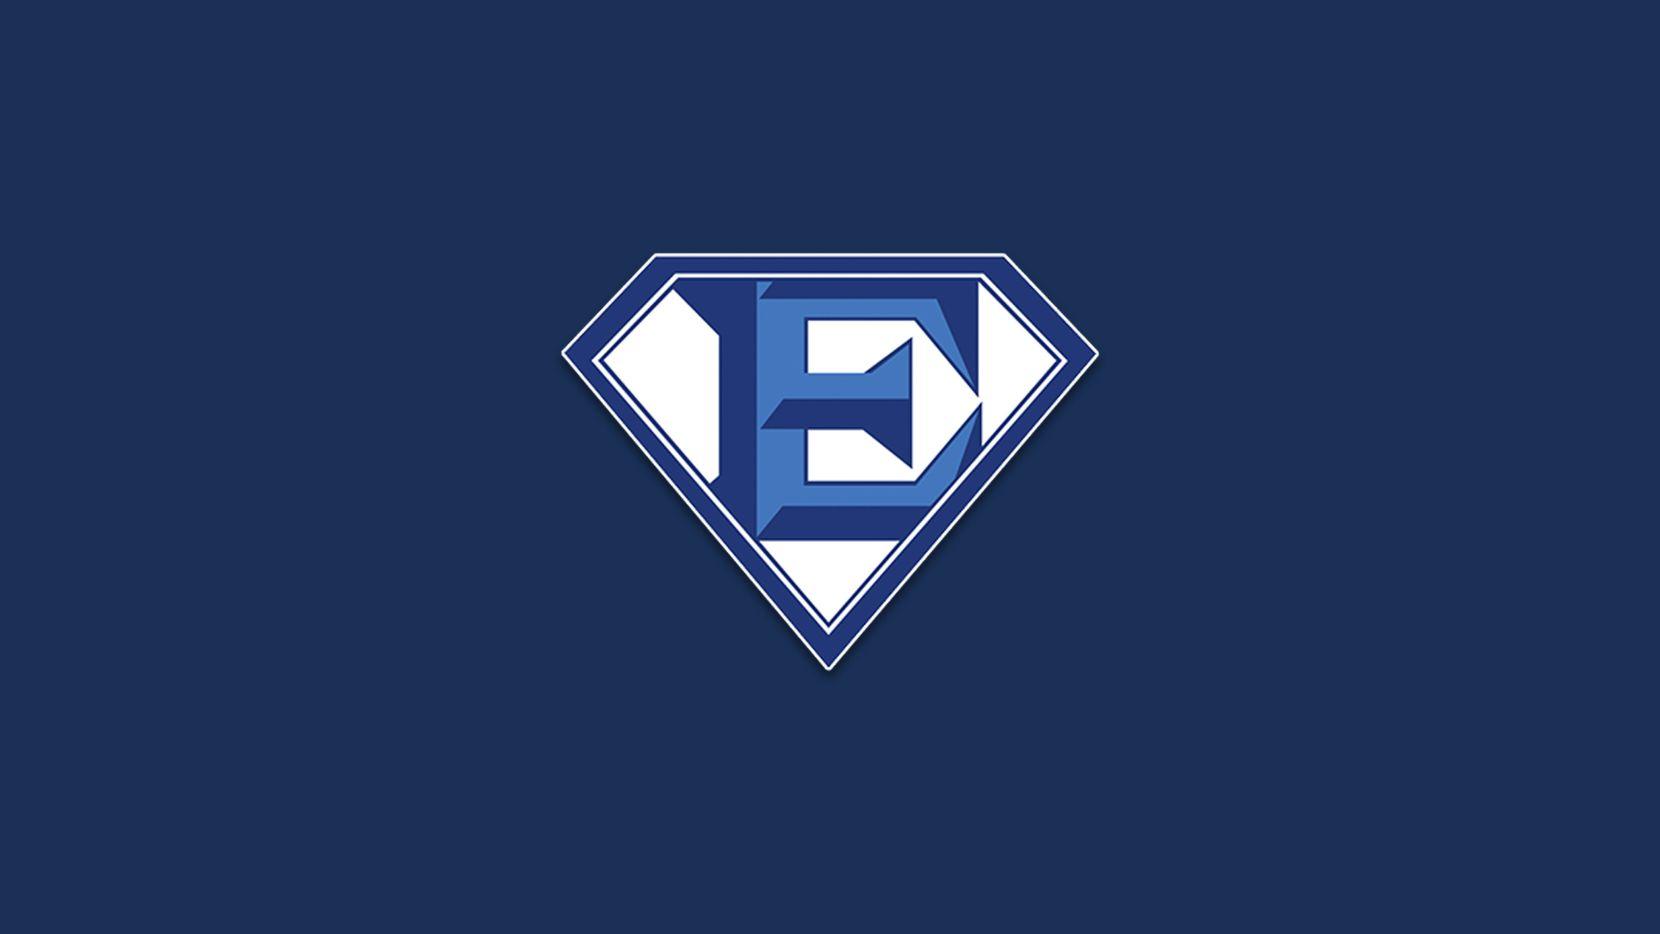 Wylie East logo.